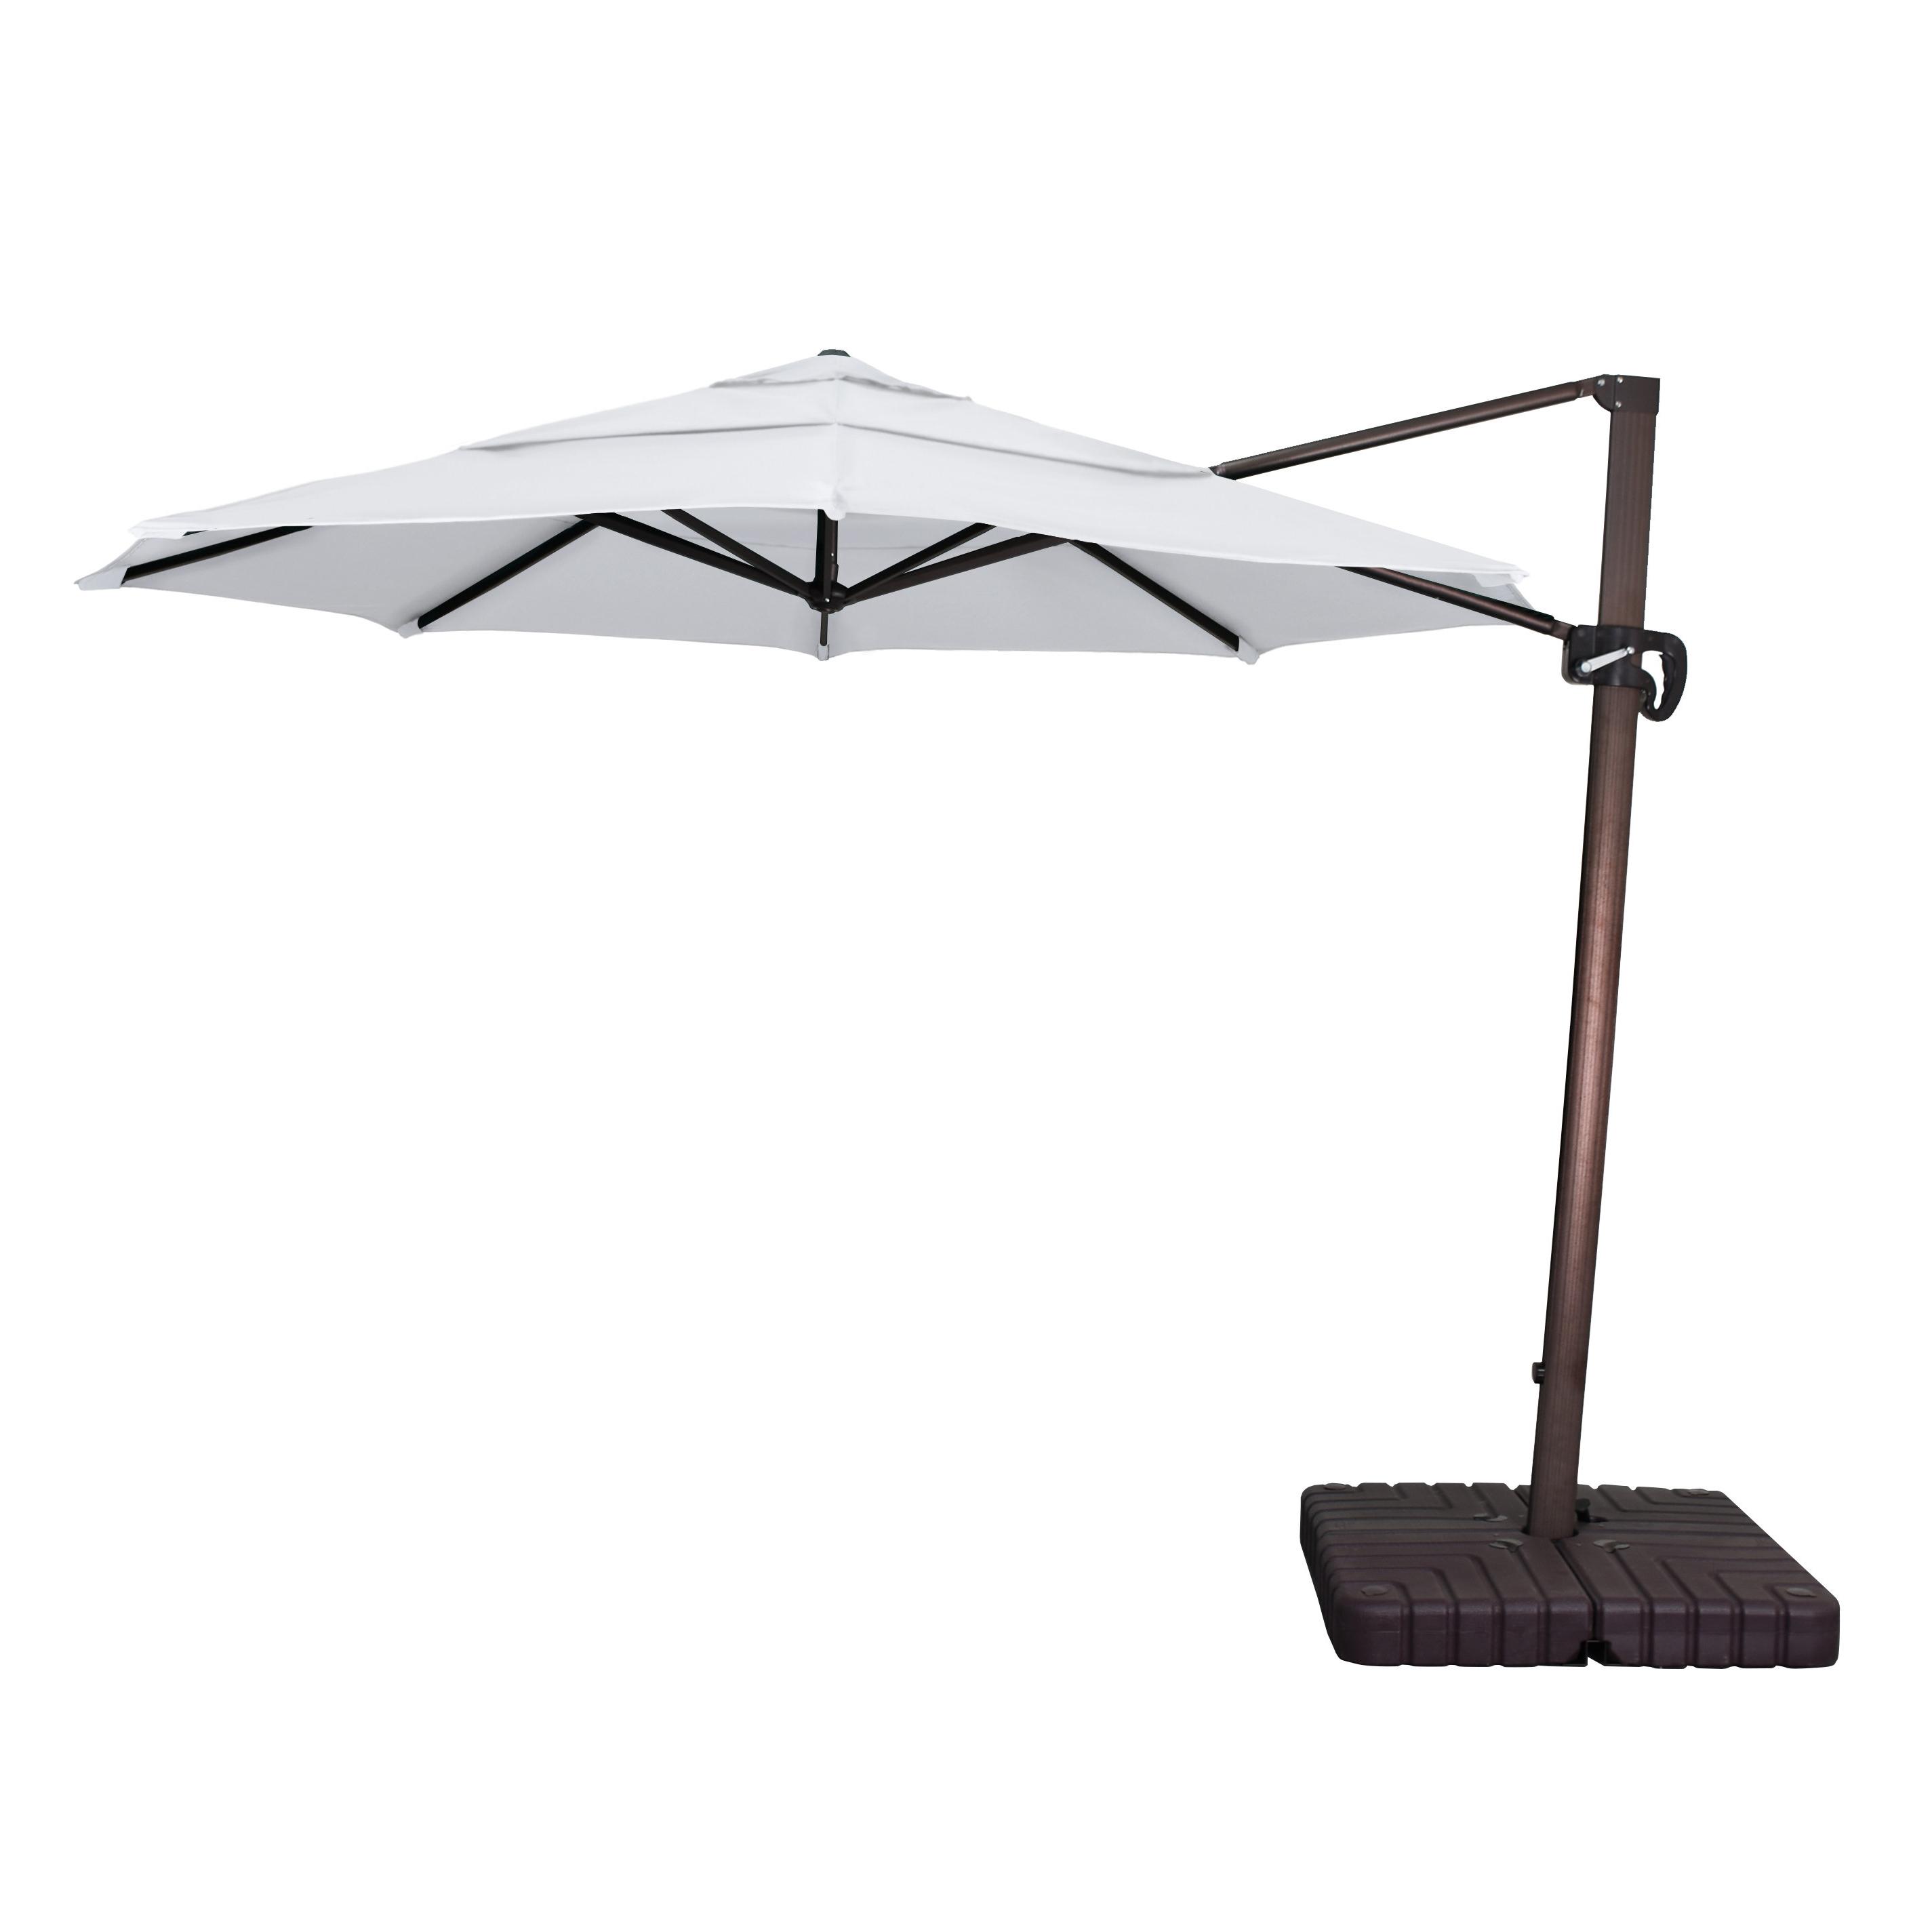 Favorite Lennie Cantilever Sunbrella Umbrellas Within Sol 72 Outdoor Carlisle Cantilever Sunbrella Umbrella (View 4 of 20)